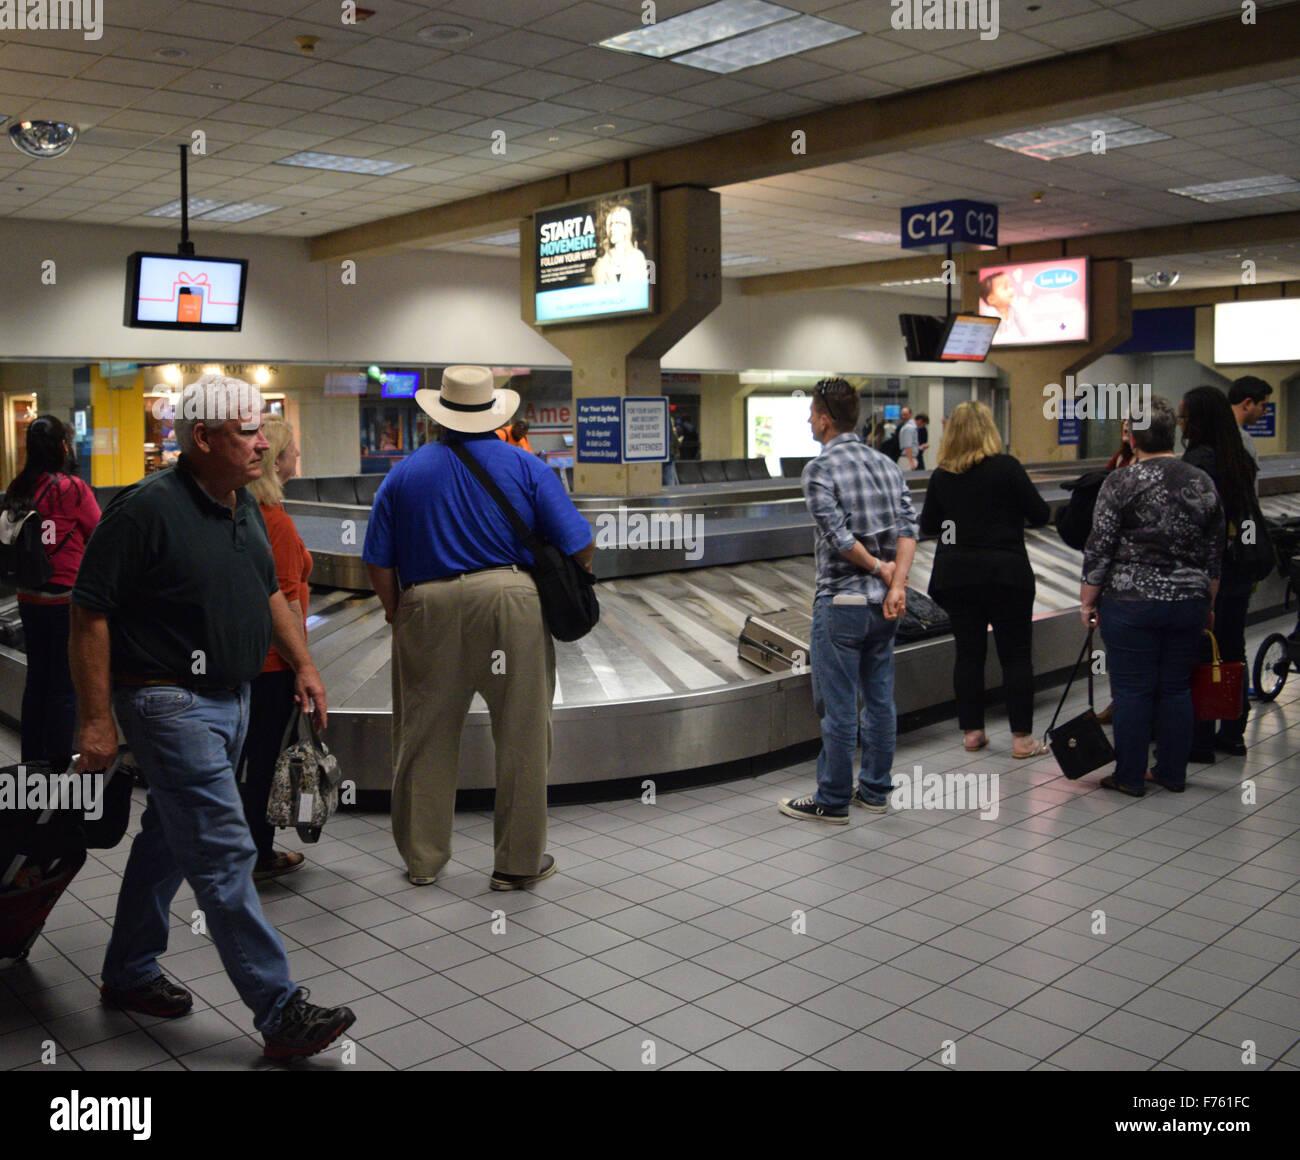 Dallas Texas Usa 25th Nov 2015 Terminal C Baggage